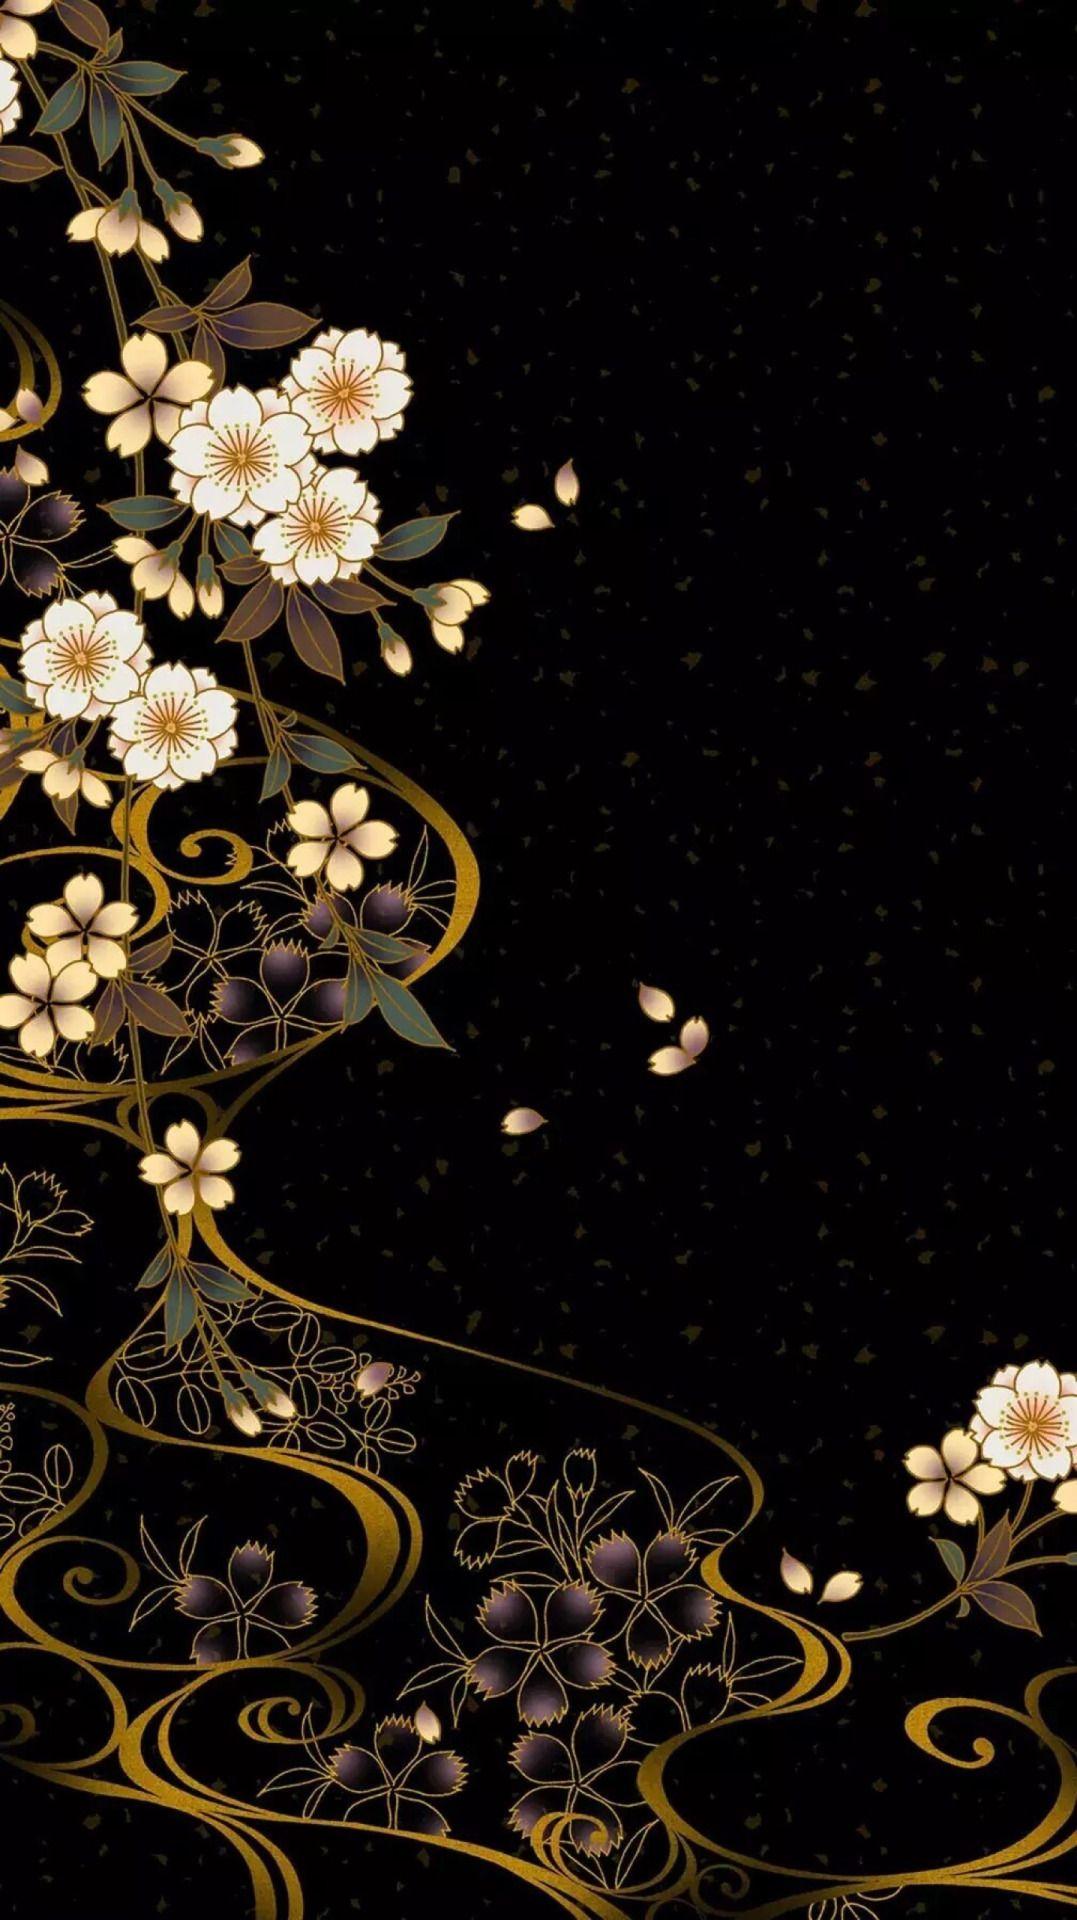 Wallpapers おしゃれまとめの人気アイデア Pinterest Sonika